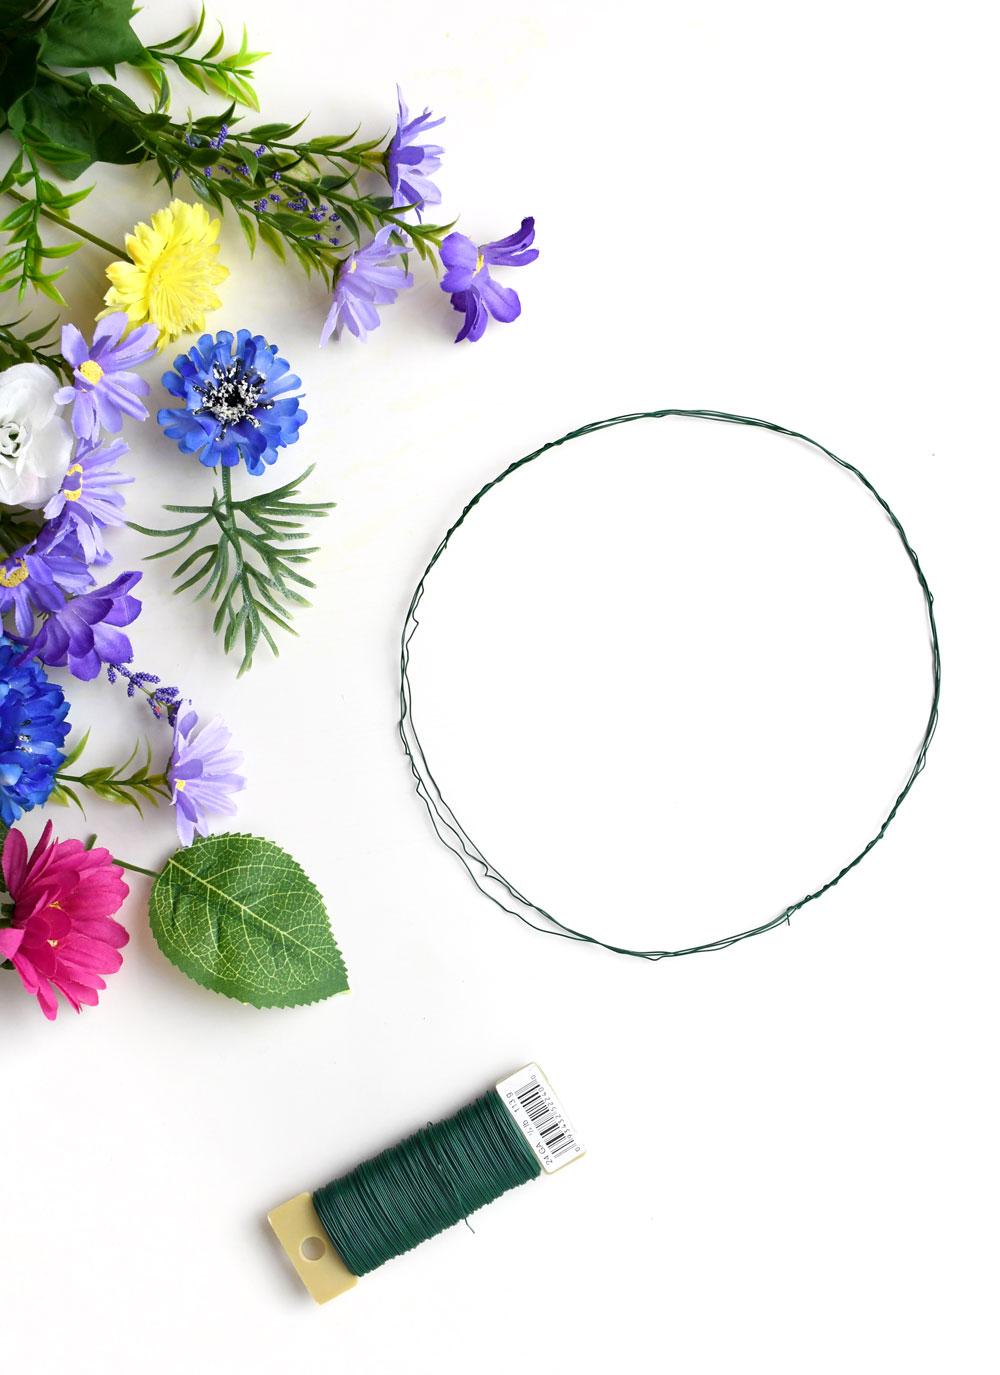 Design a DIY flower crown using silk flowers